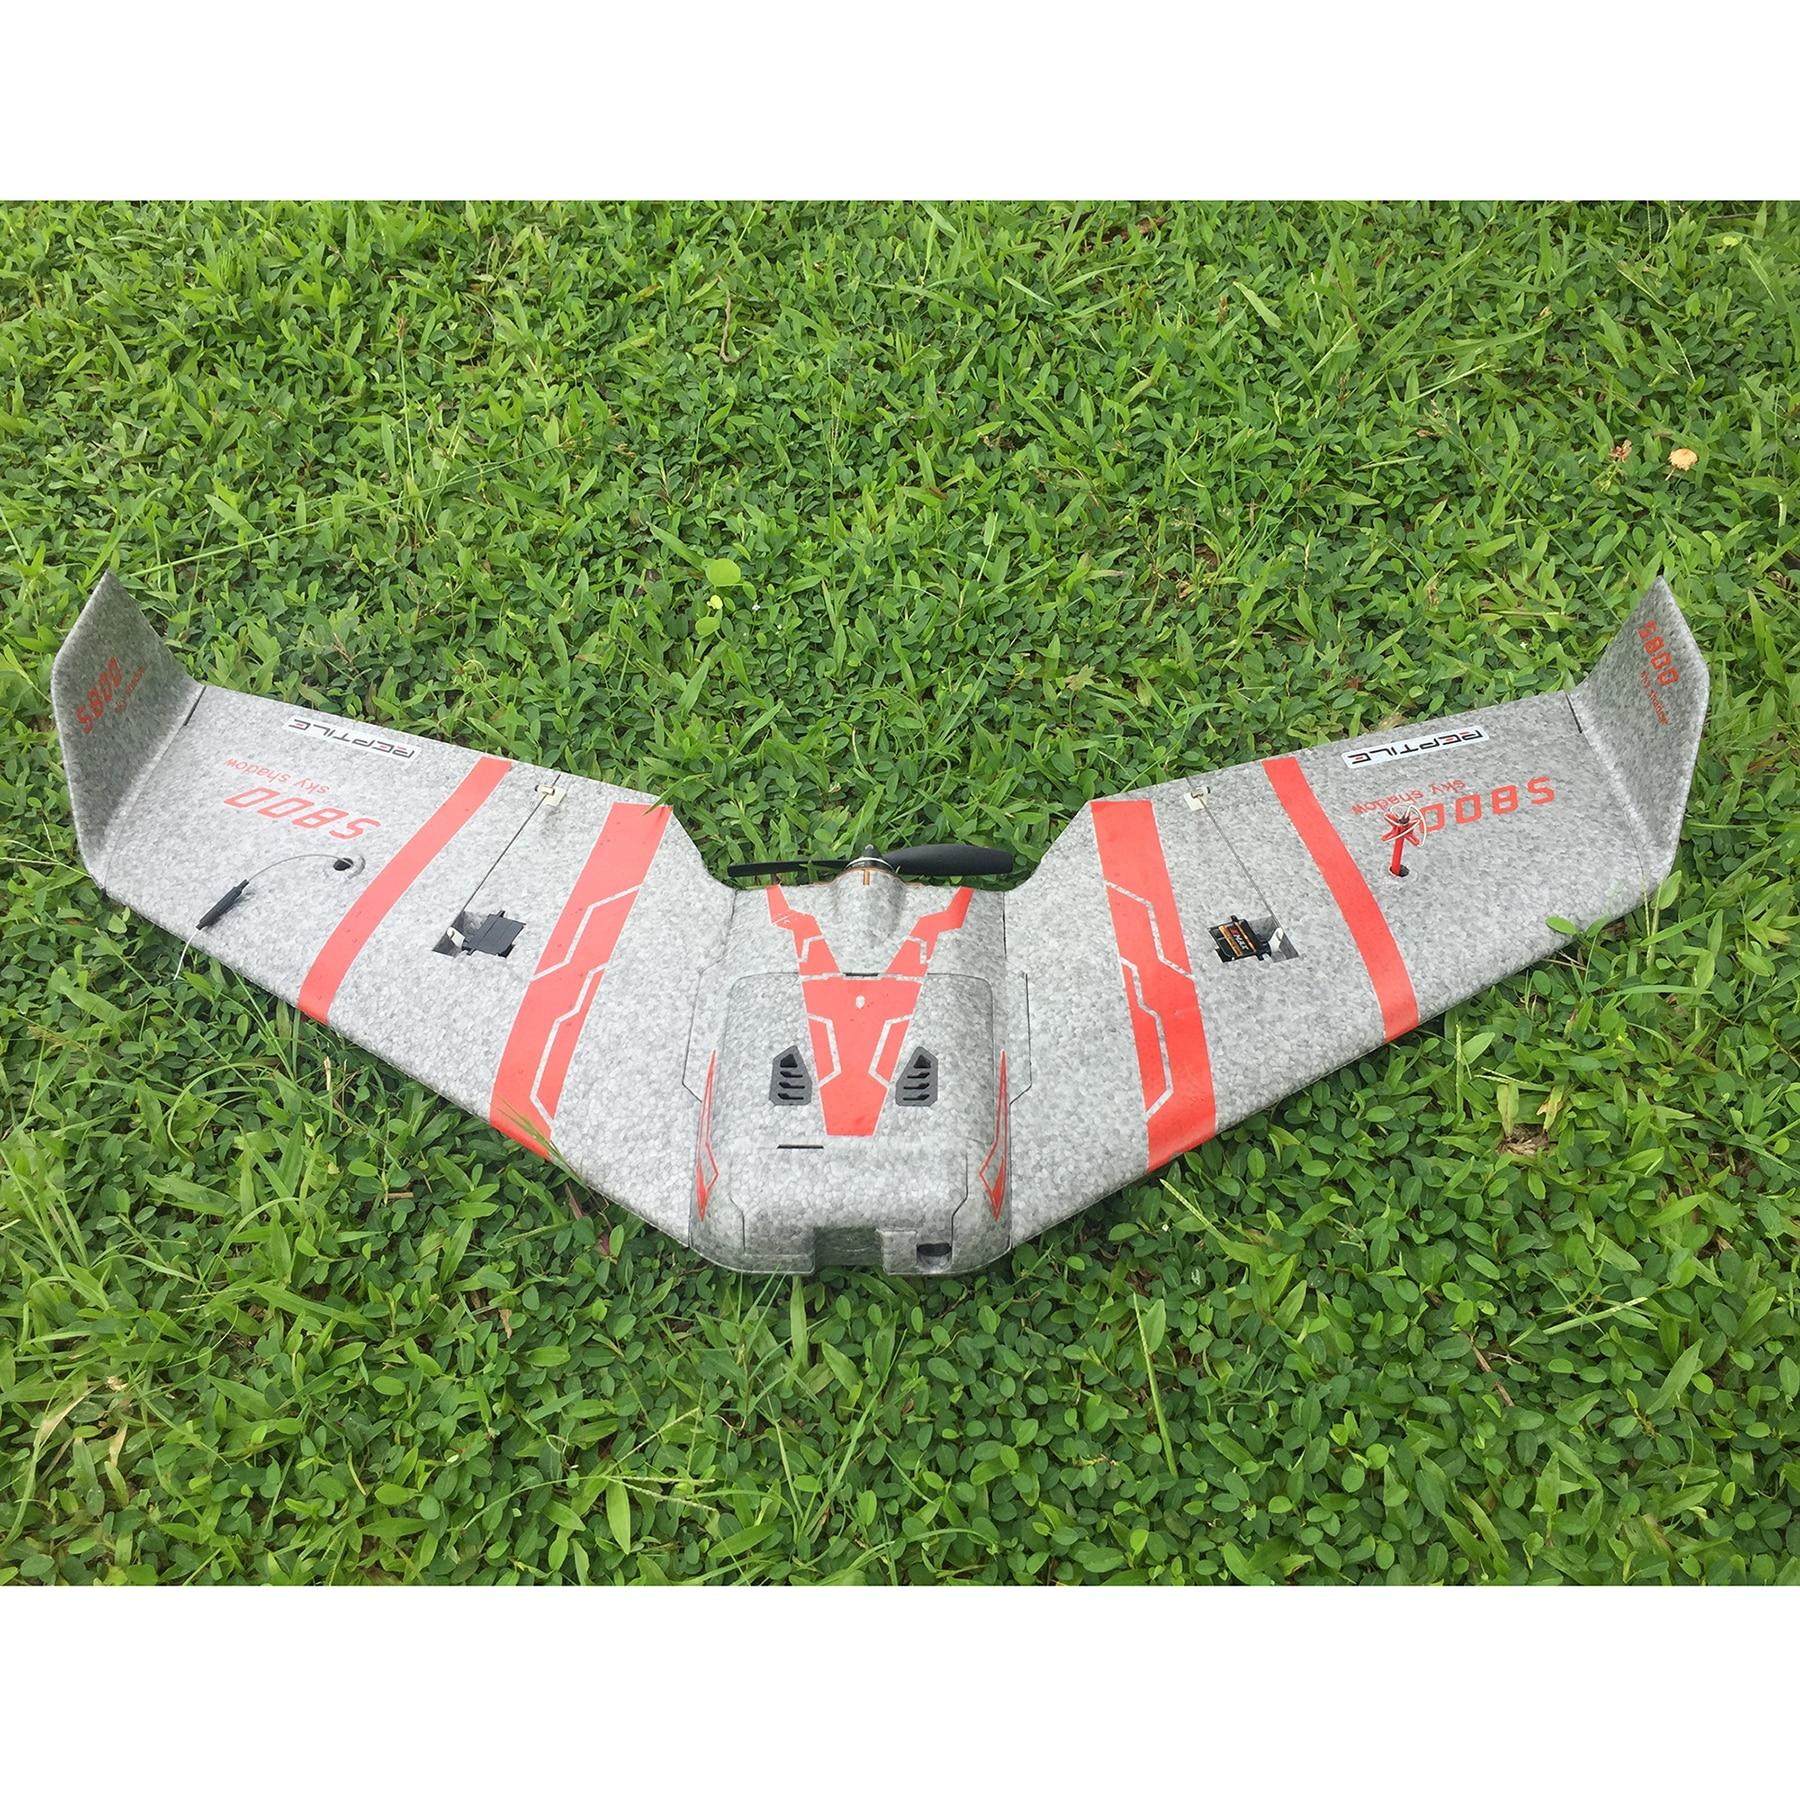 Набор гоночных крыльев Reptile S800 V2 SKY SHADOW 820 мм, размах крыльев, серый FPV EPP